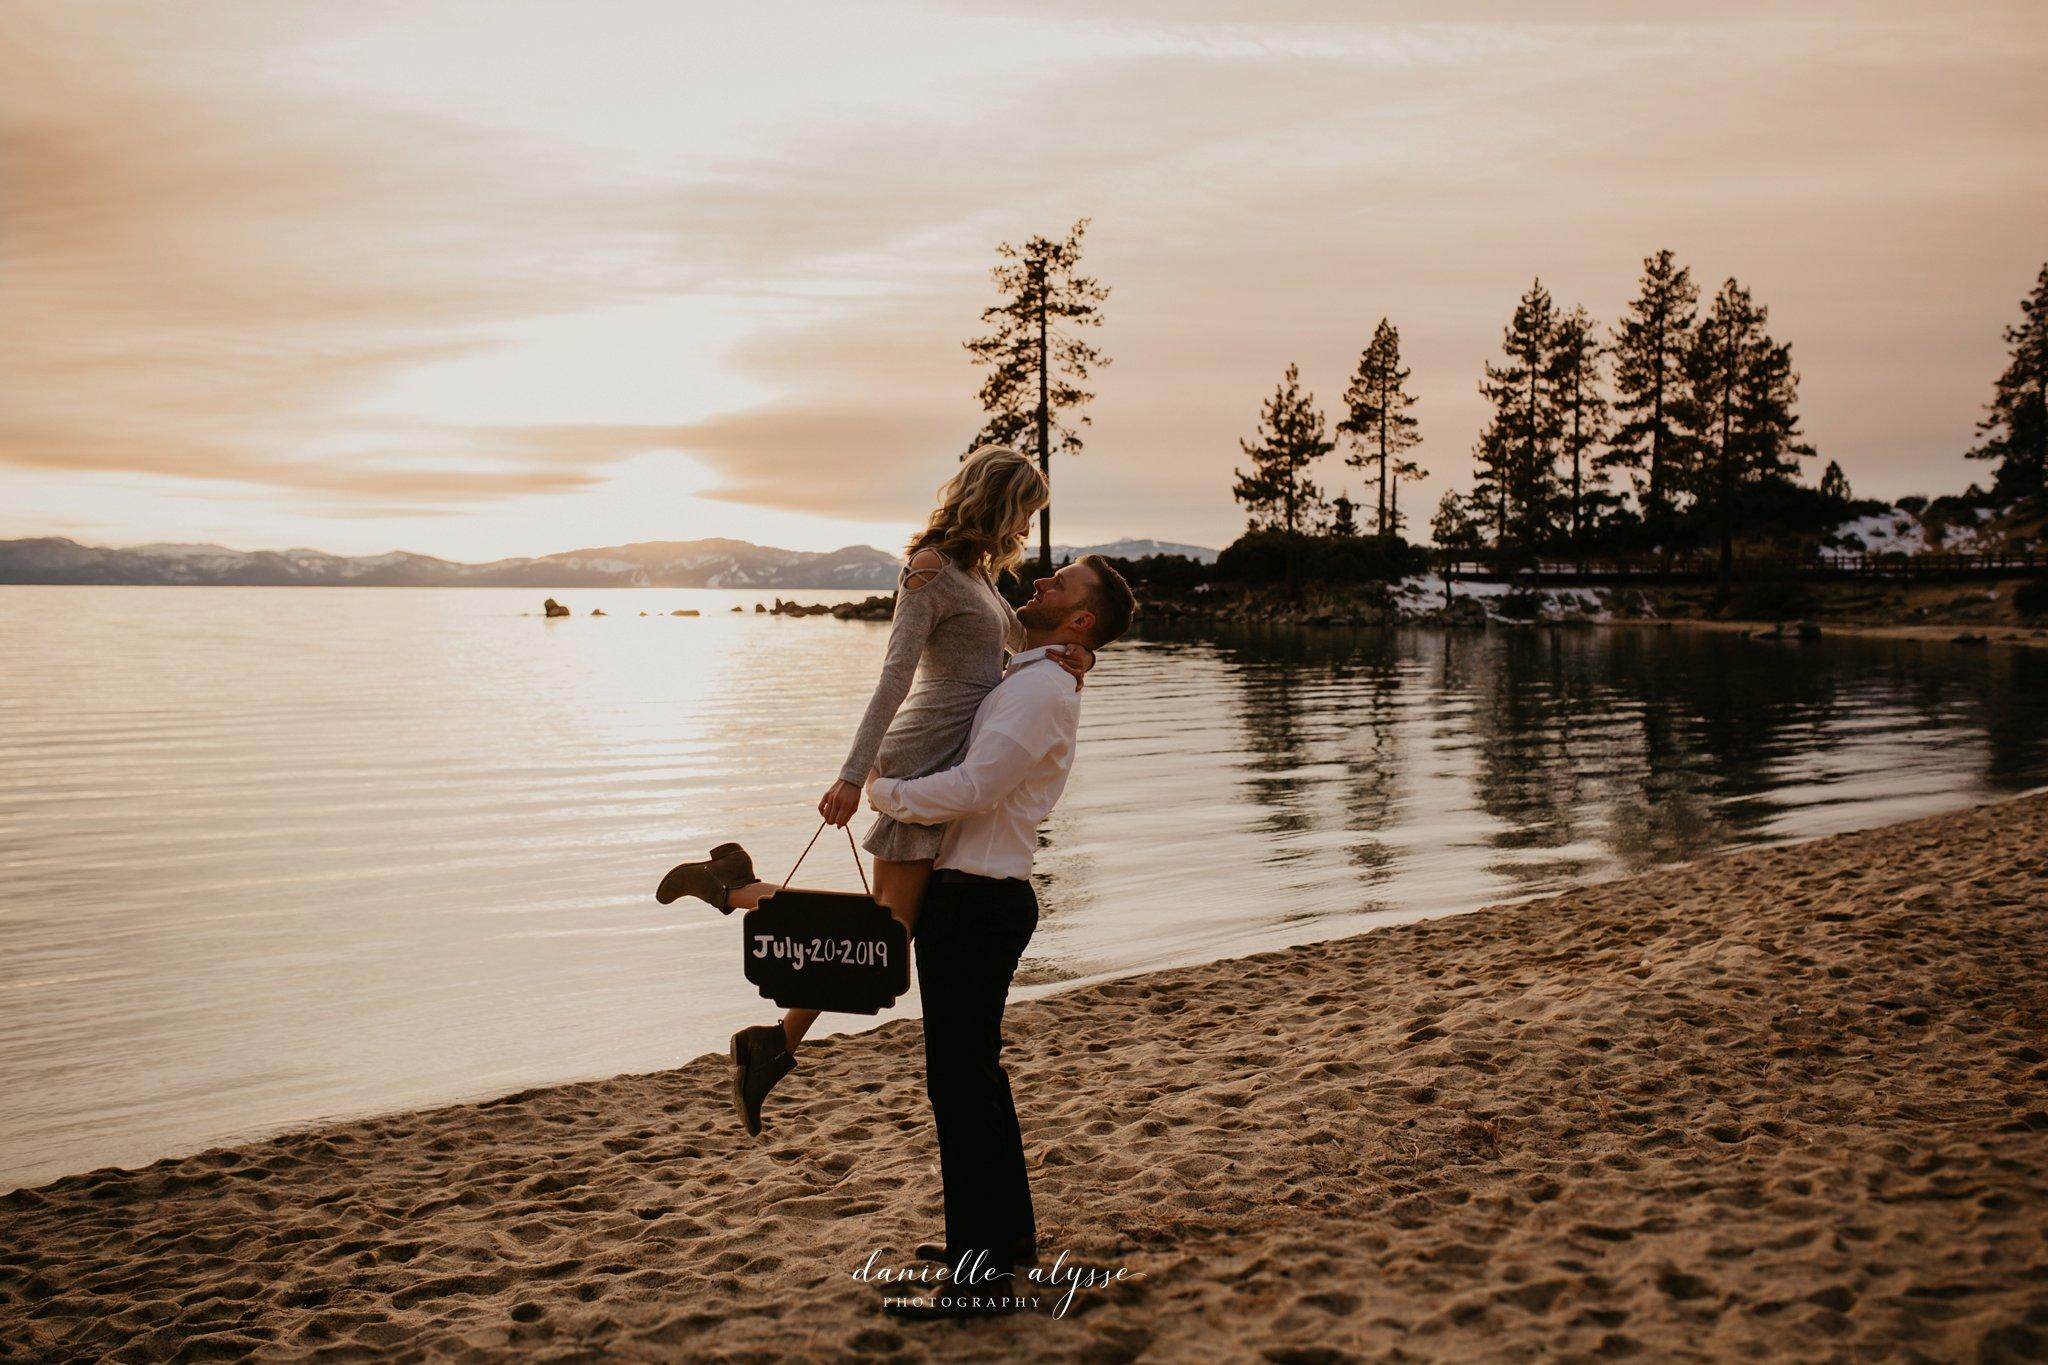 181226_engagement_brittney_fred_tahoe_sand_harbor_danielle_alysse_photography_blog_66_WEB.jpg